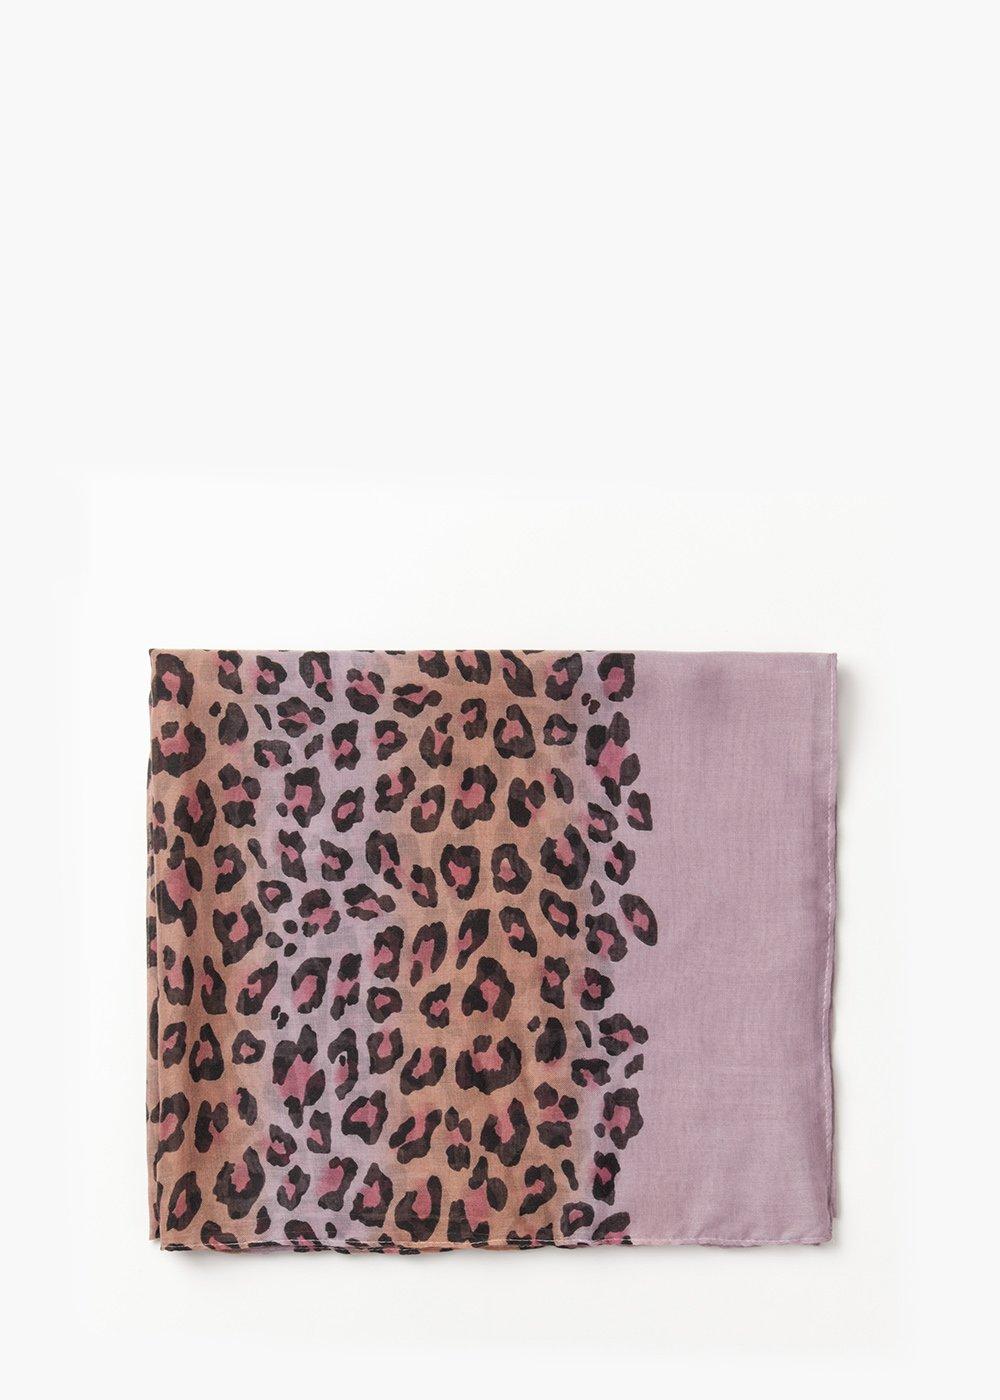 Sady multicolour animalier print scarf - Sughero / Solvente   Fantasia - Woman